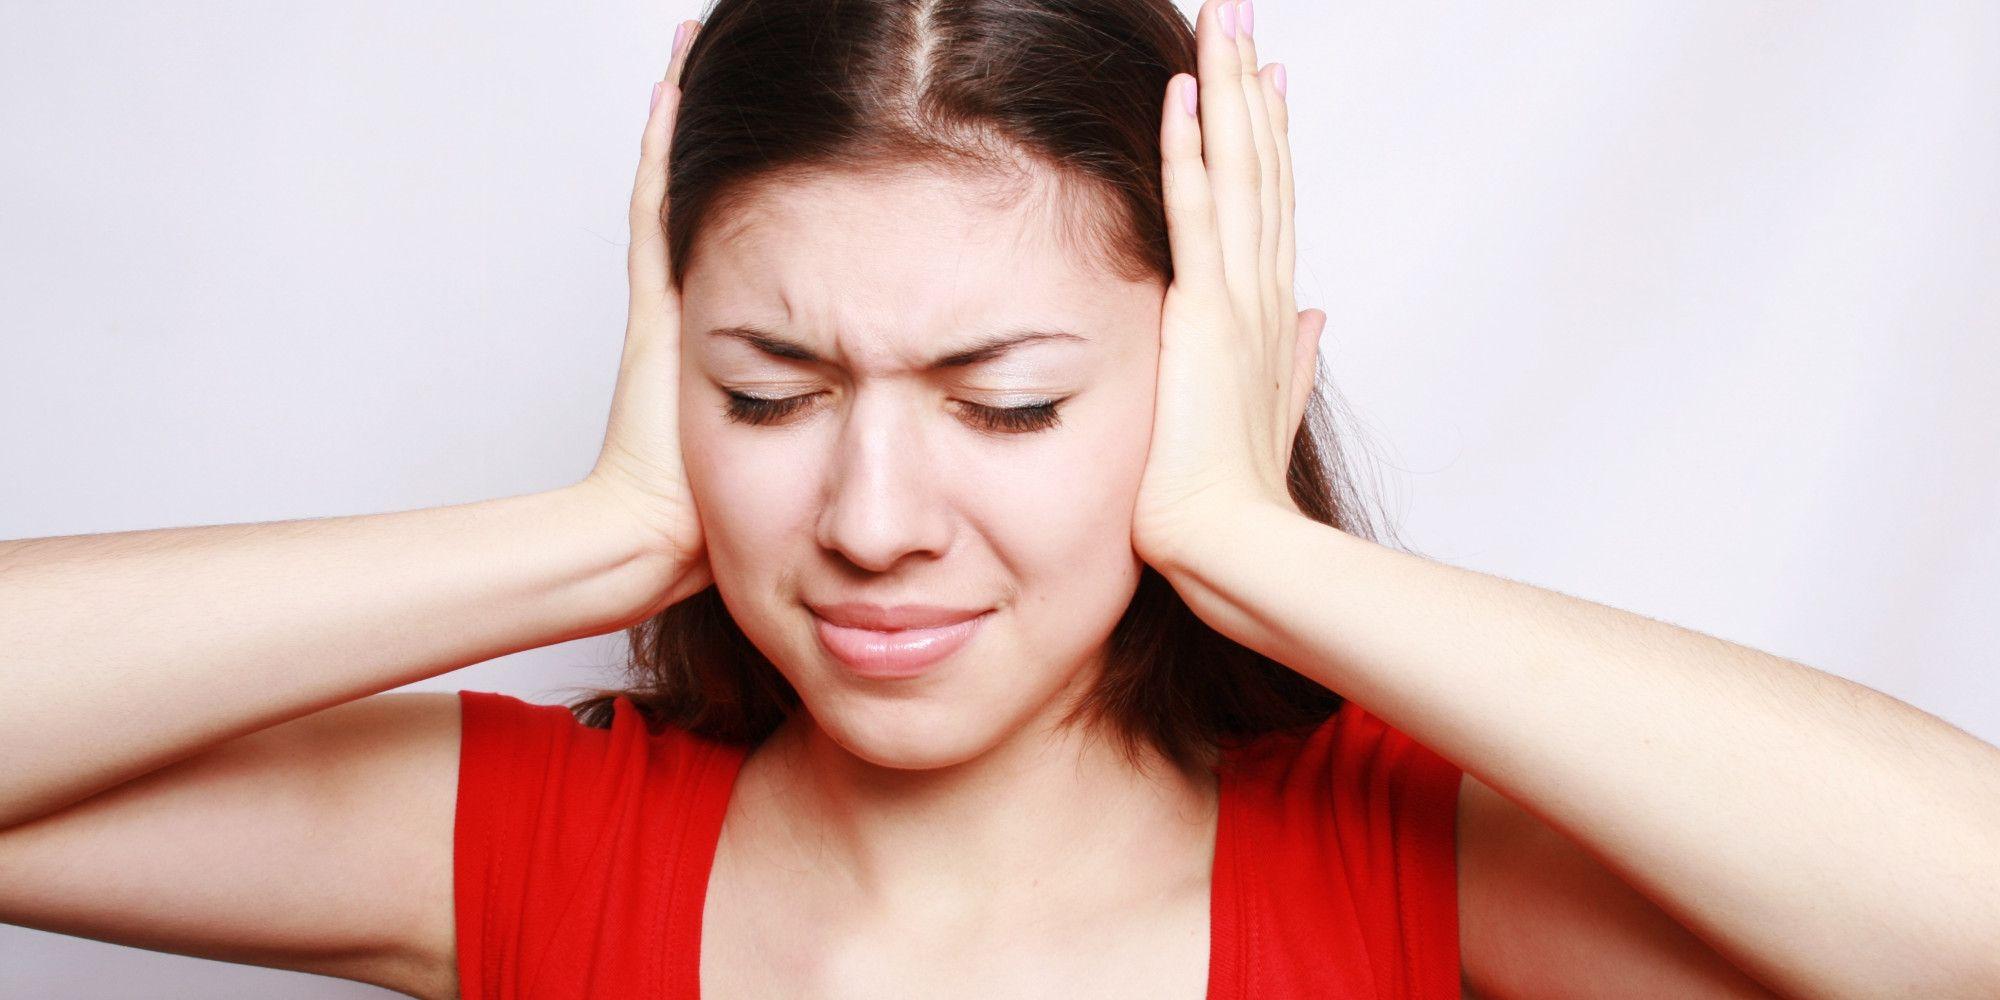 Turn Down the Music! NoiseInduced Hearing Loss Ear